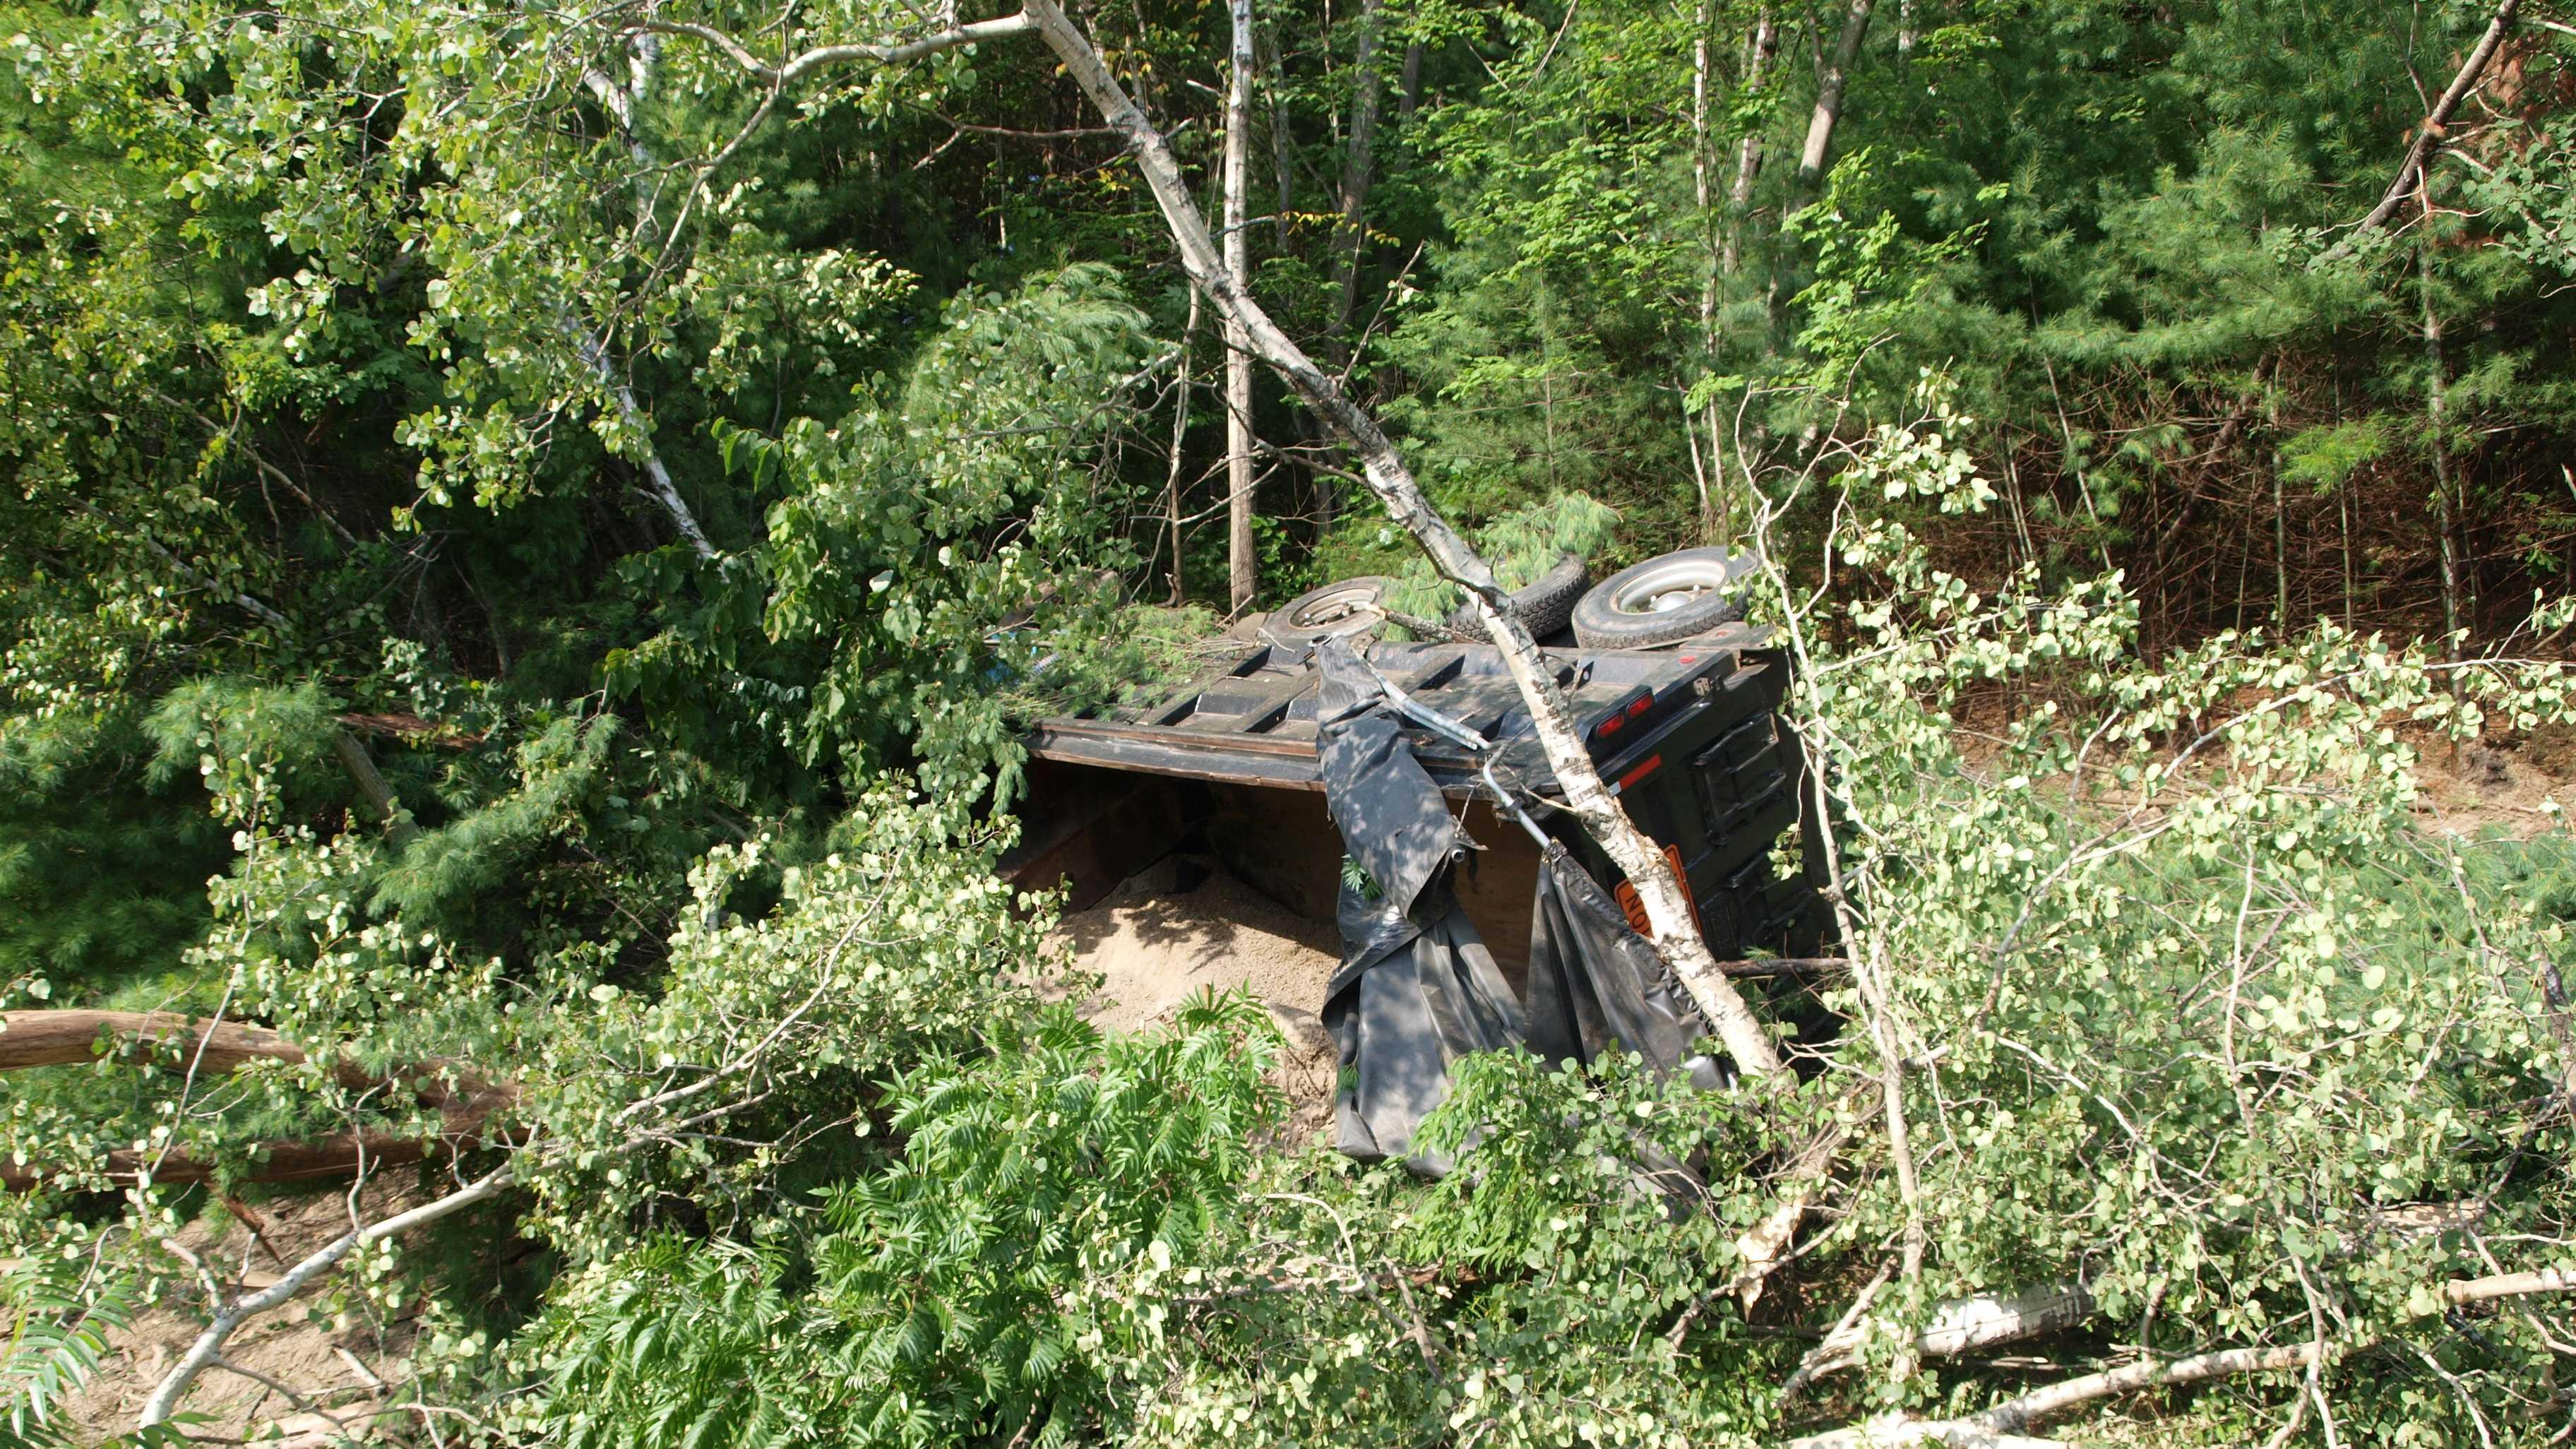 A dump truck crashed on Interstate 93 in Ashland